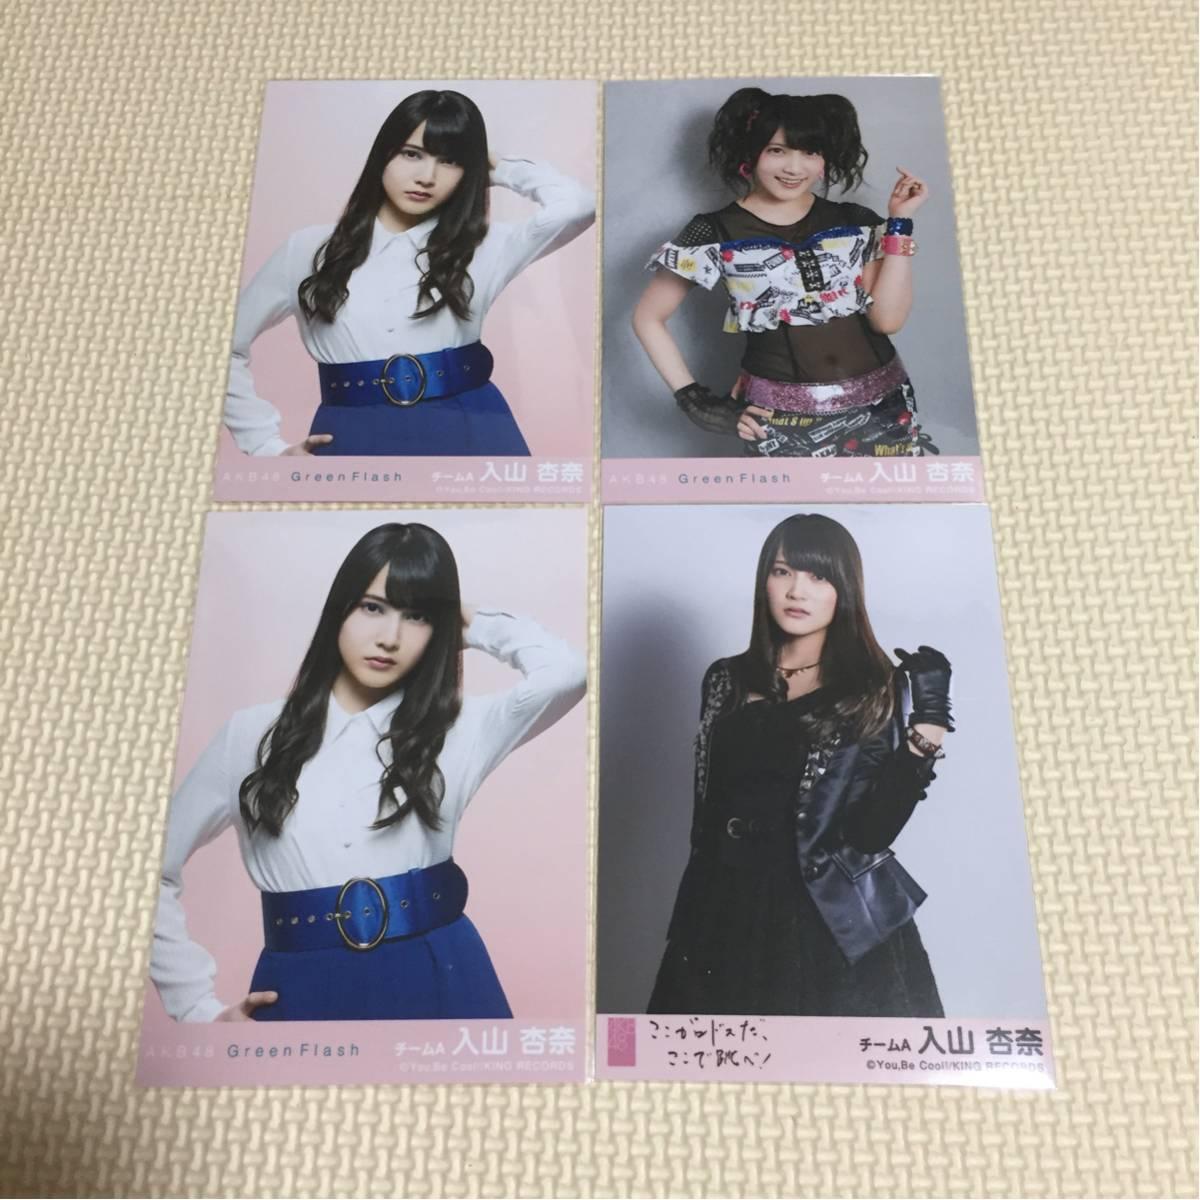 AKB48 入山杏奈 写真4枚まとめ グリーンフラッシュ劇場盤 ここがロドスだ、ここで跳べ!劇場盤